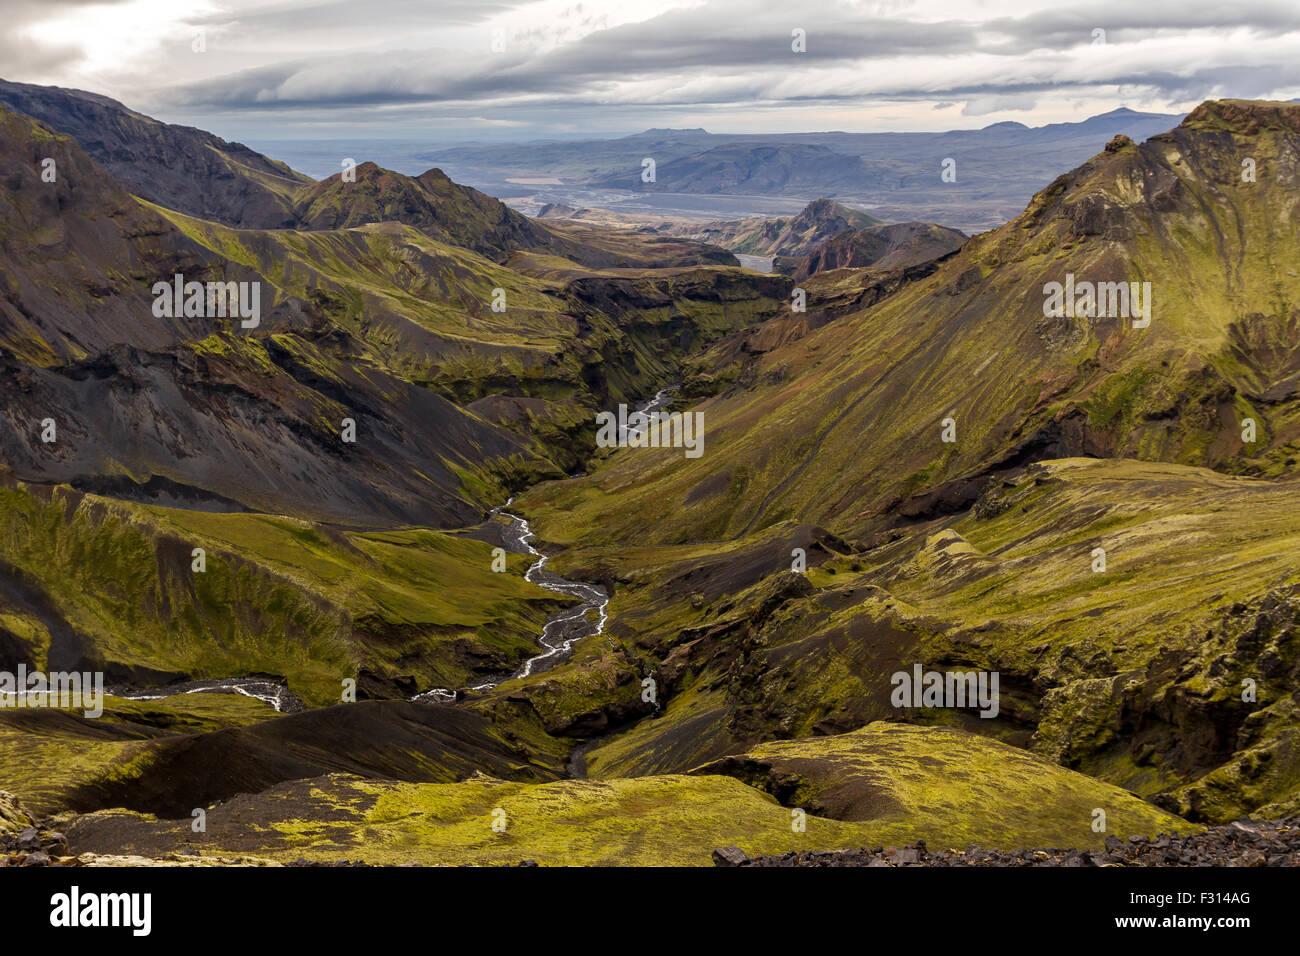 Goðaland, Iceland - Stock Image